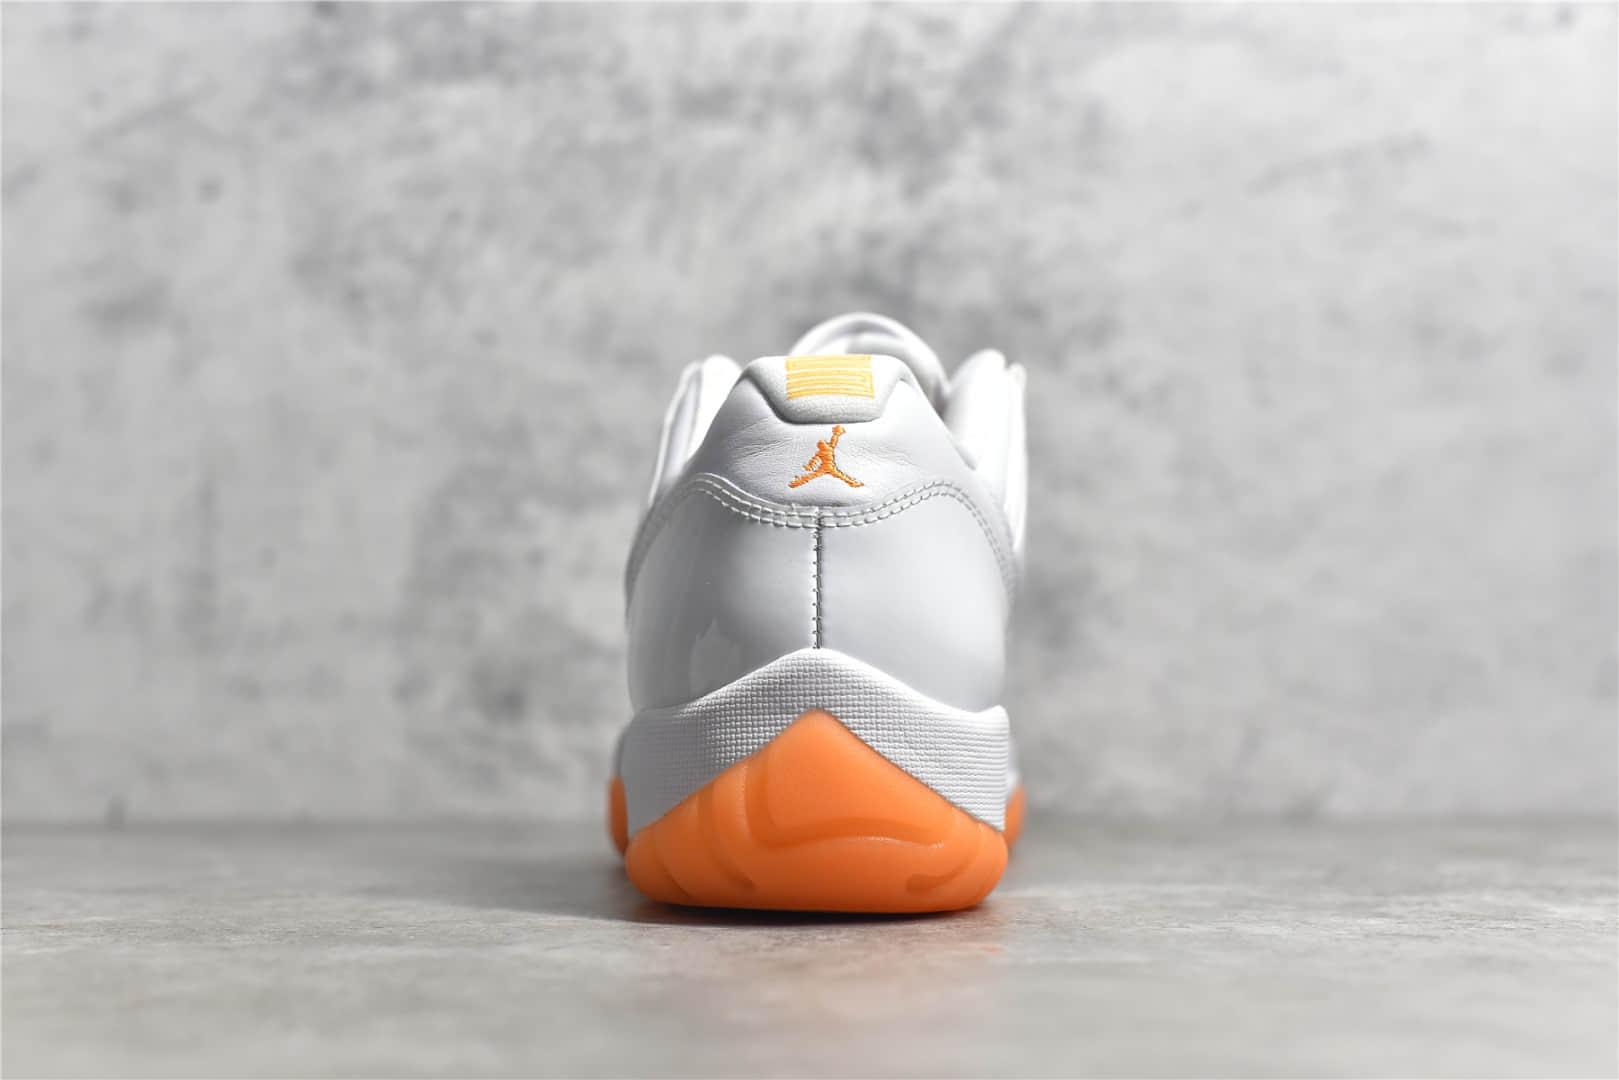 "AJ11白橙低帮篮球鞋 Air Jordan 11 Retro Low ""Bright citrus""白橙 H12纯原AJ新款白橙 货号:AH7860-139-潮流者之家"